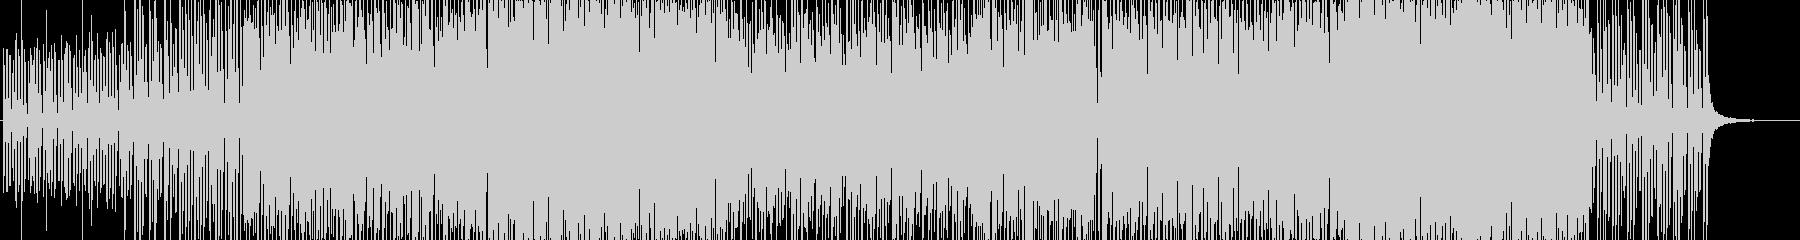 GoPro-動画-テクノハウス-EDMの未再生の波形